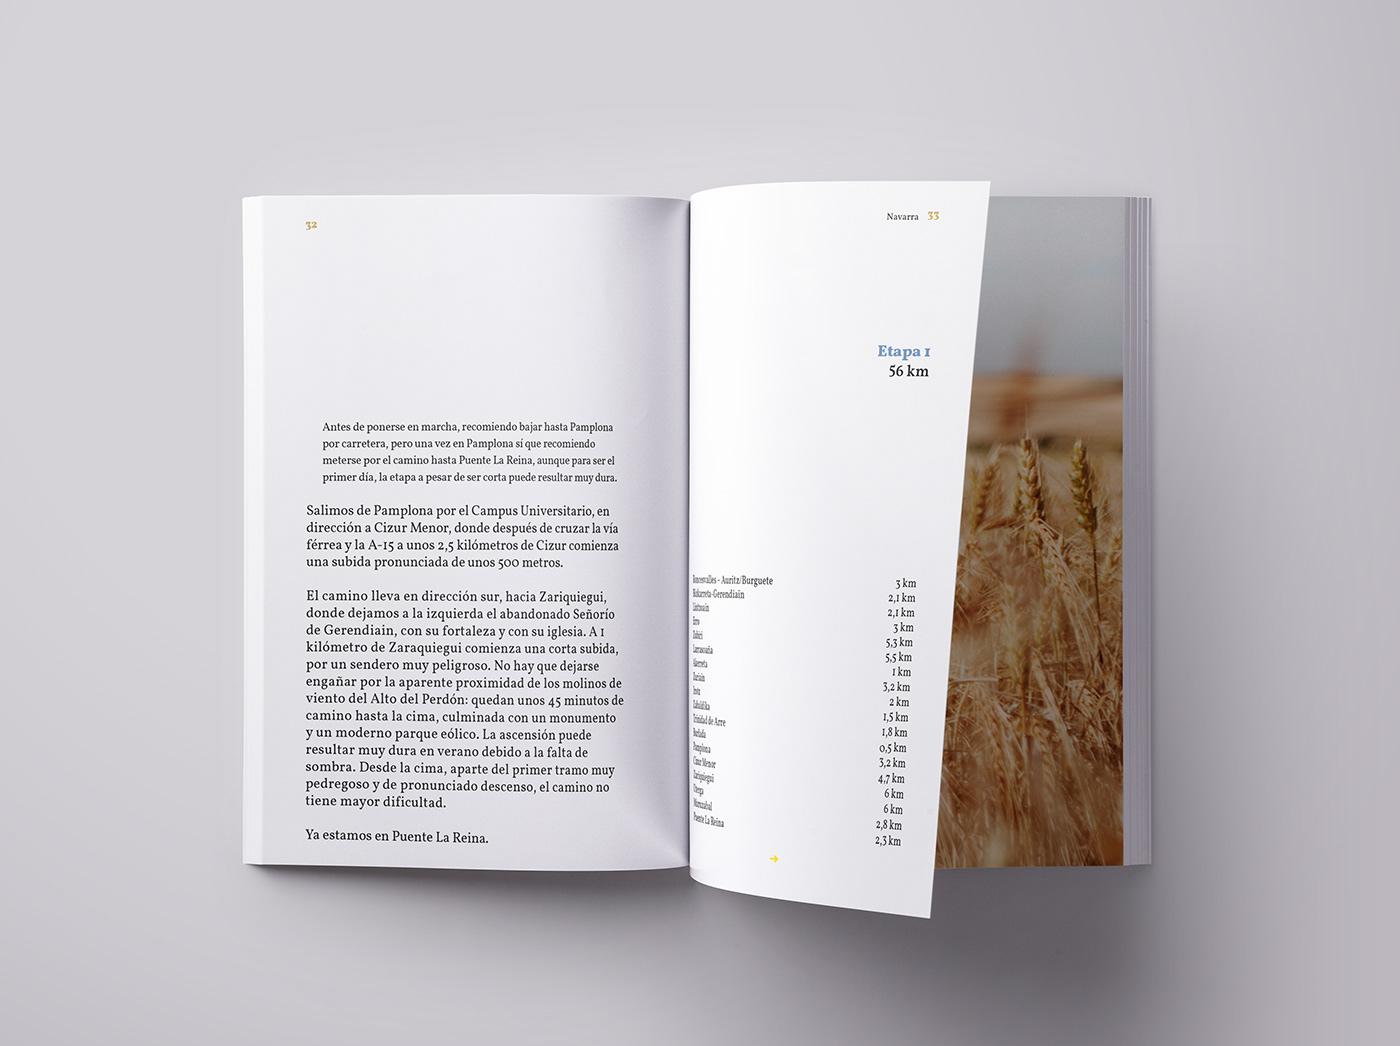 artwork book Camino de Santiago design digital editorial editorialdesign minimal Photography  Travel